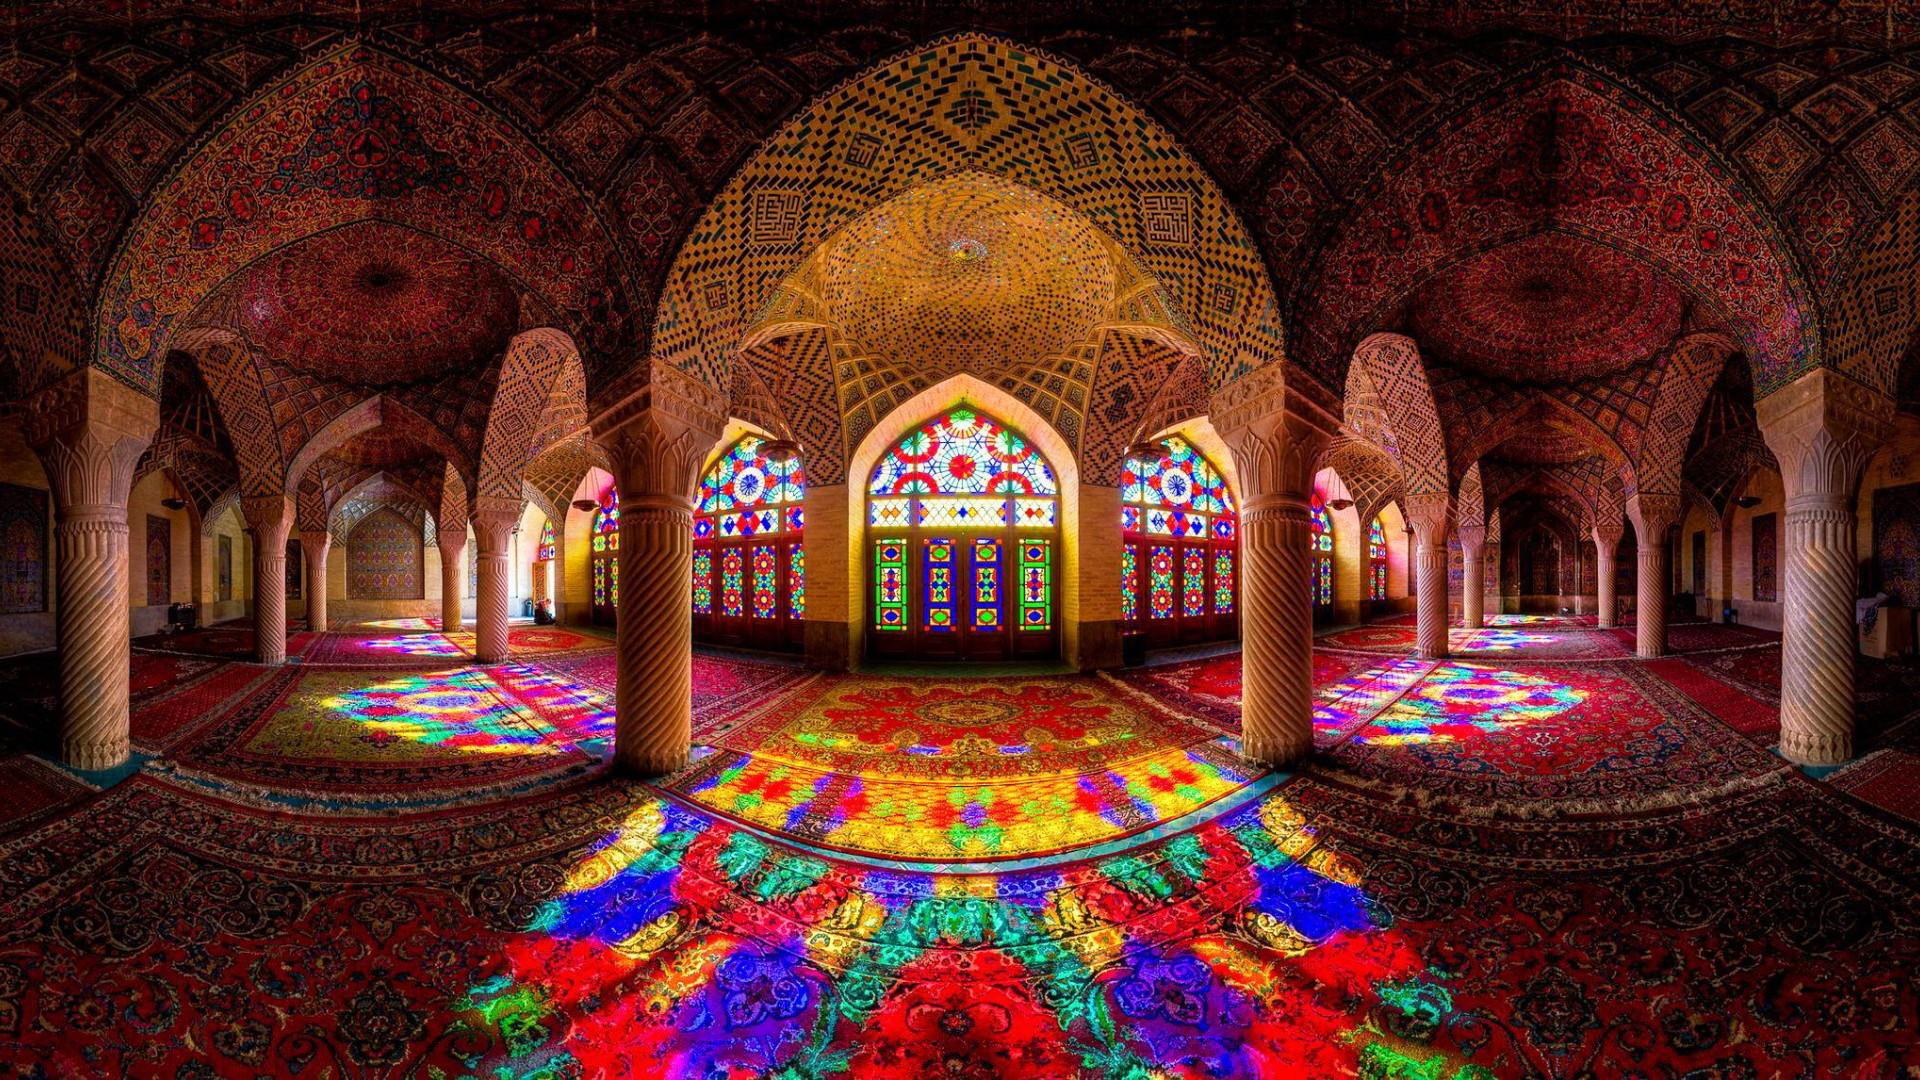 Res: 1920x1080, Download now full hd wallpaper masjid al-haram inside view mosque mecca ...